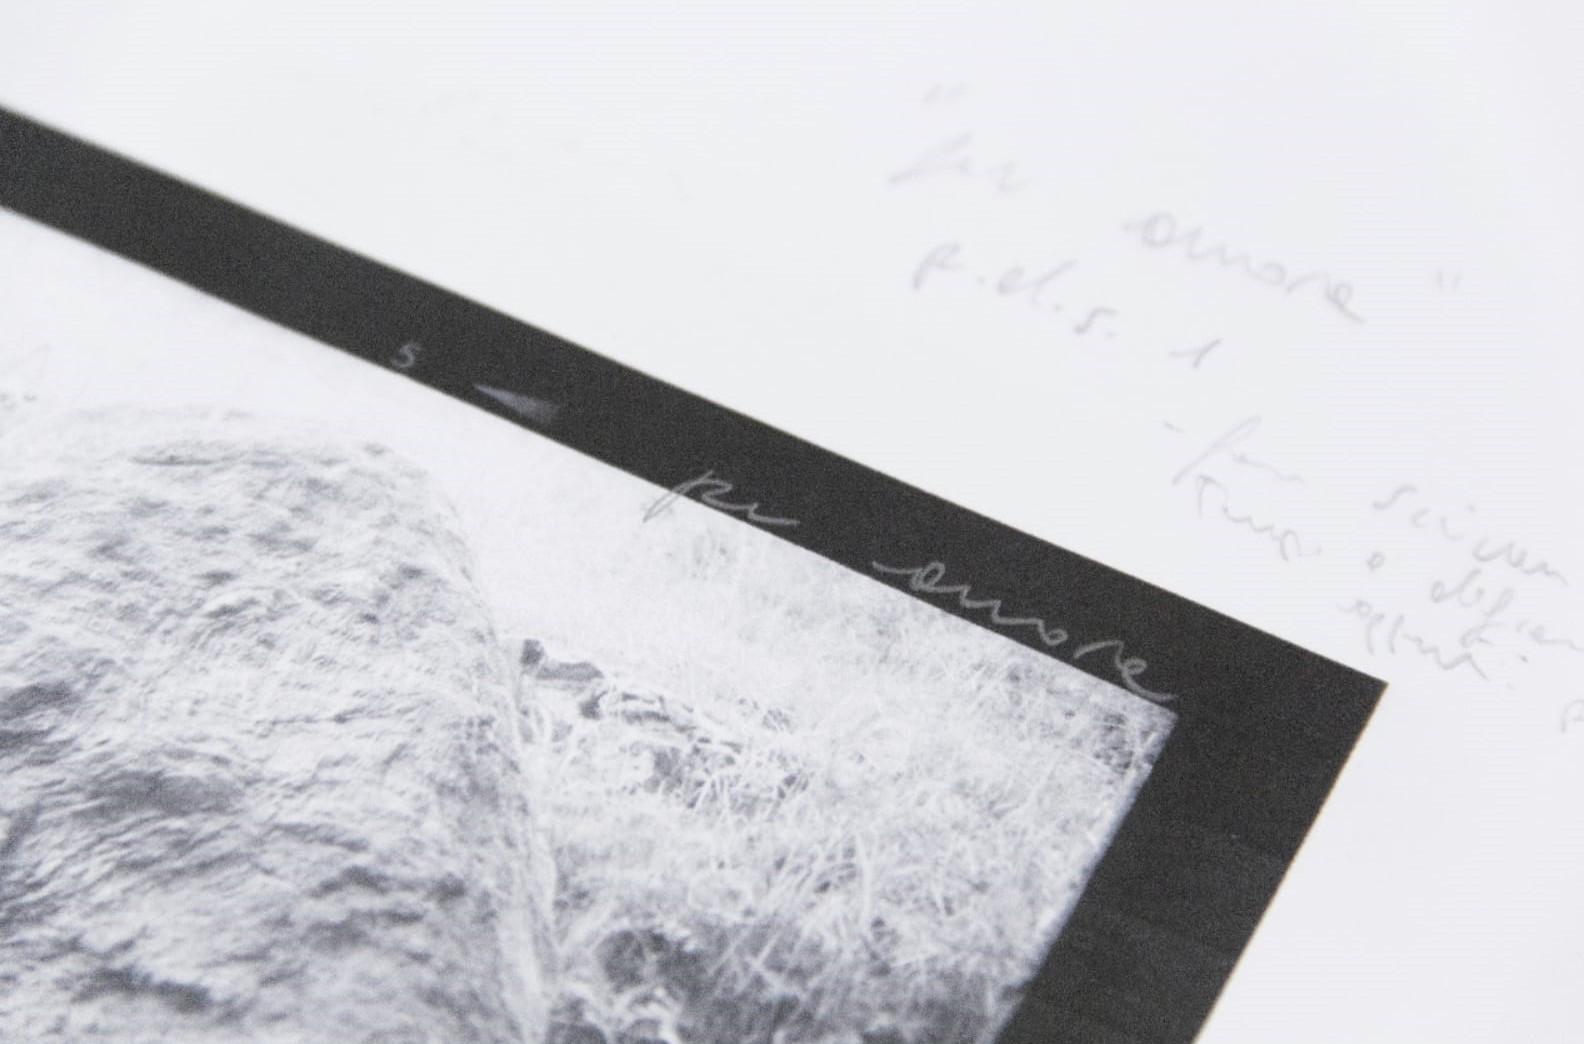 Lidia Bianchi - Courtesy l_artista e Associazione falia